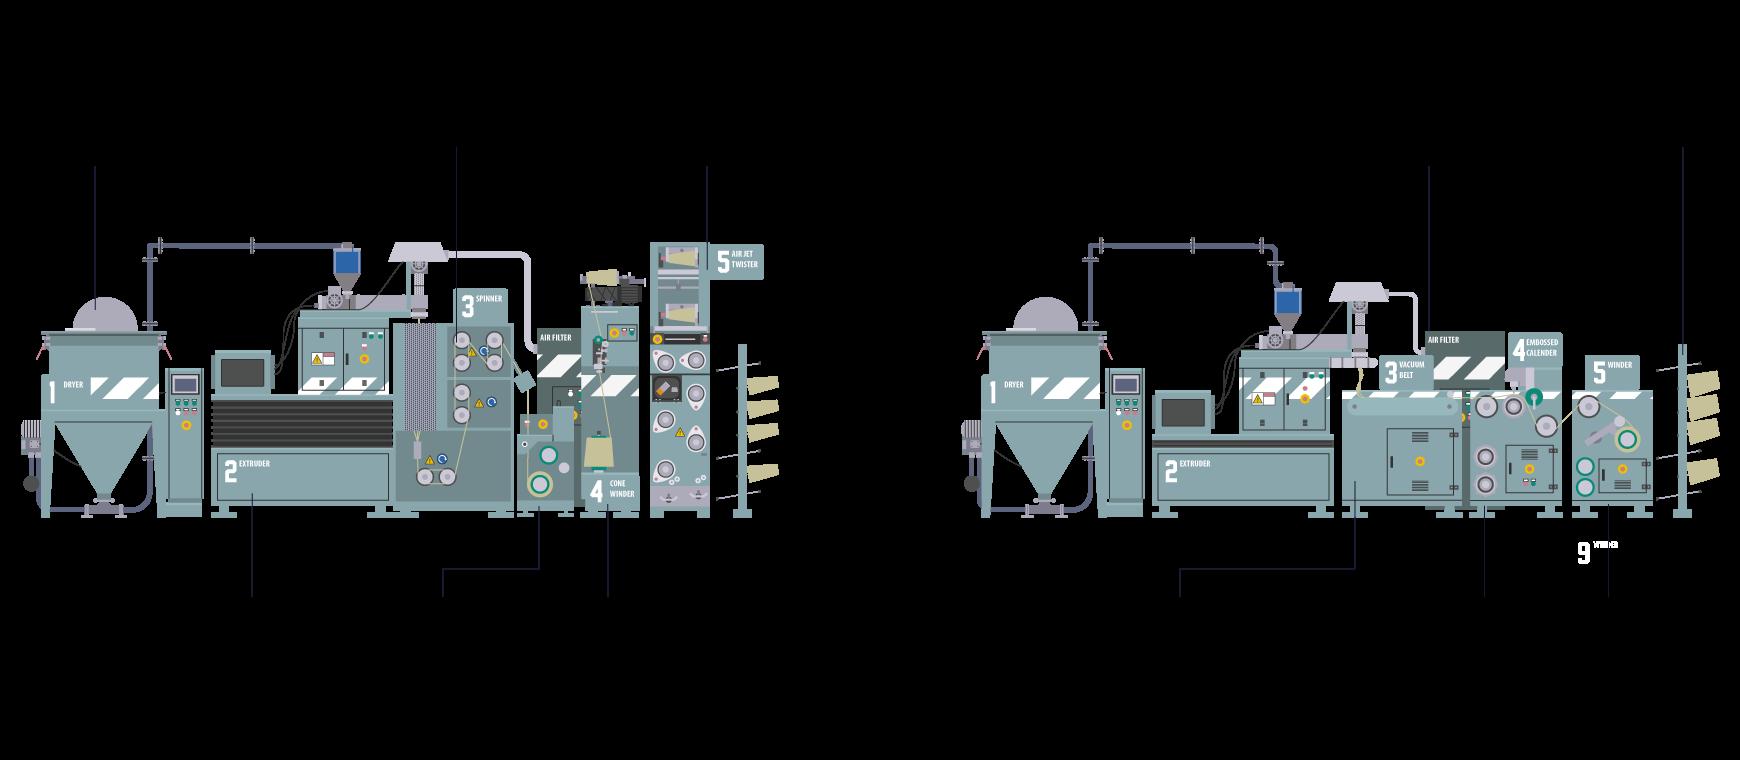 TP-Filament-Melt-Spnning-Edition-Machine-Sketch-rev1-High-Resolution